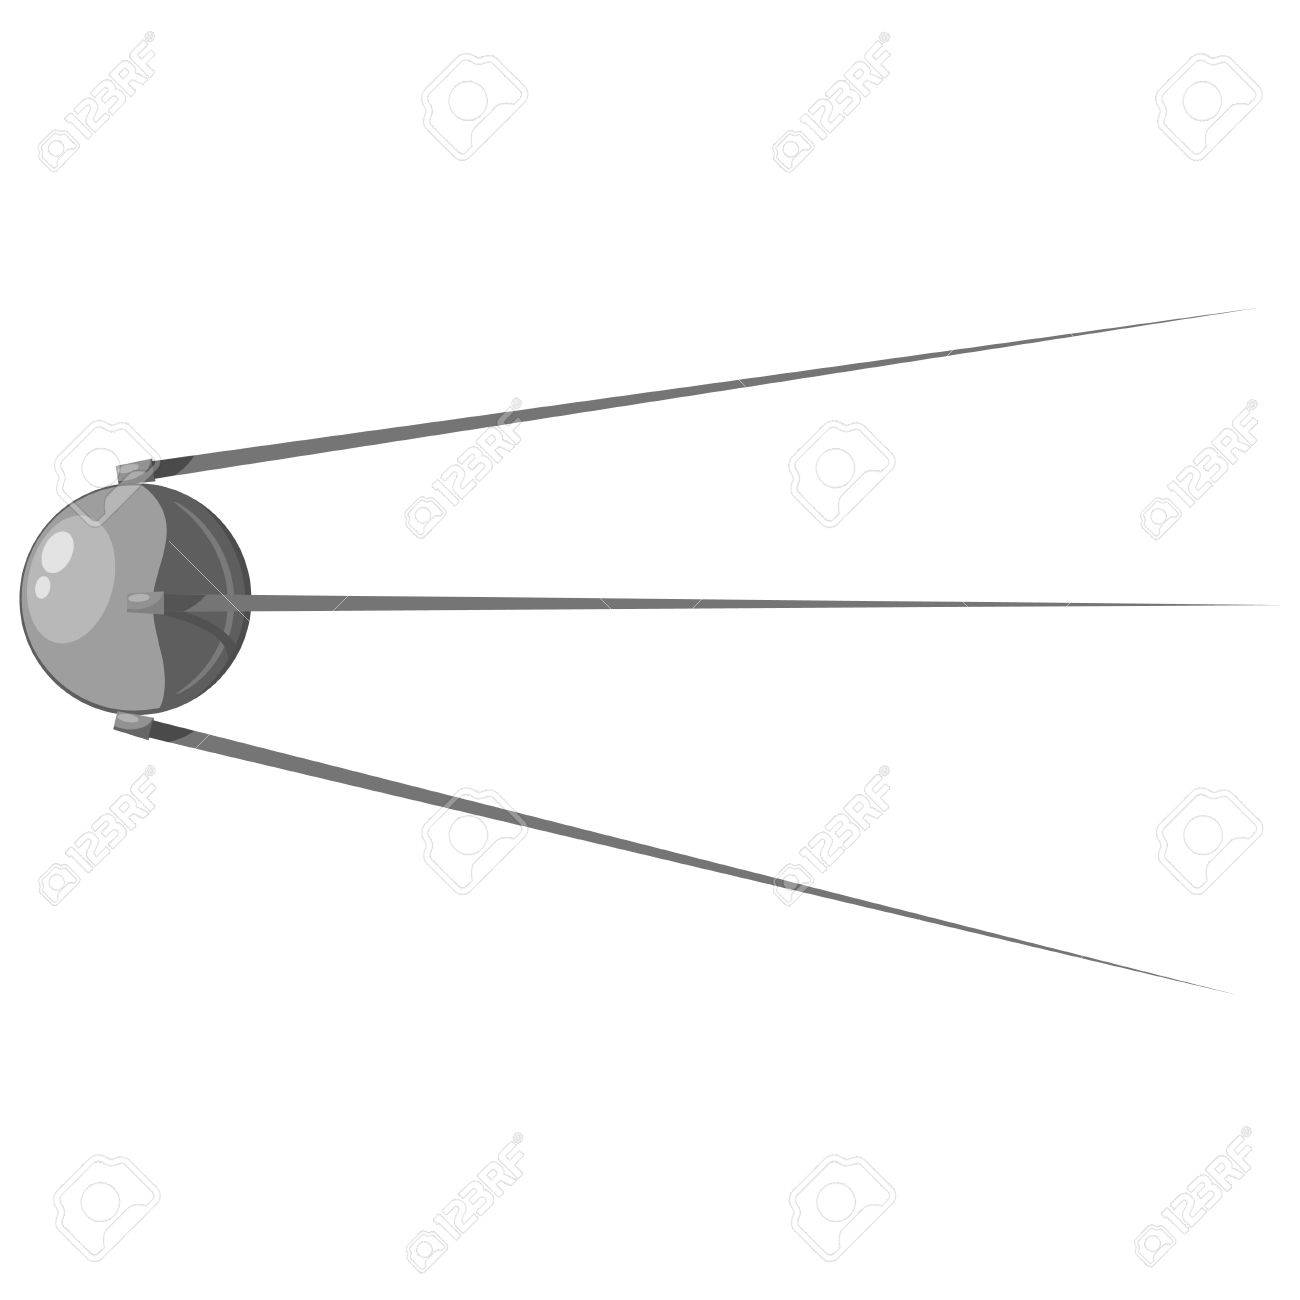 Cartoon satellite. Stock Vector - 16109120